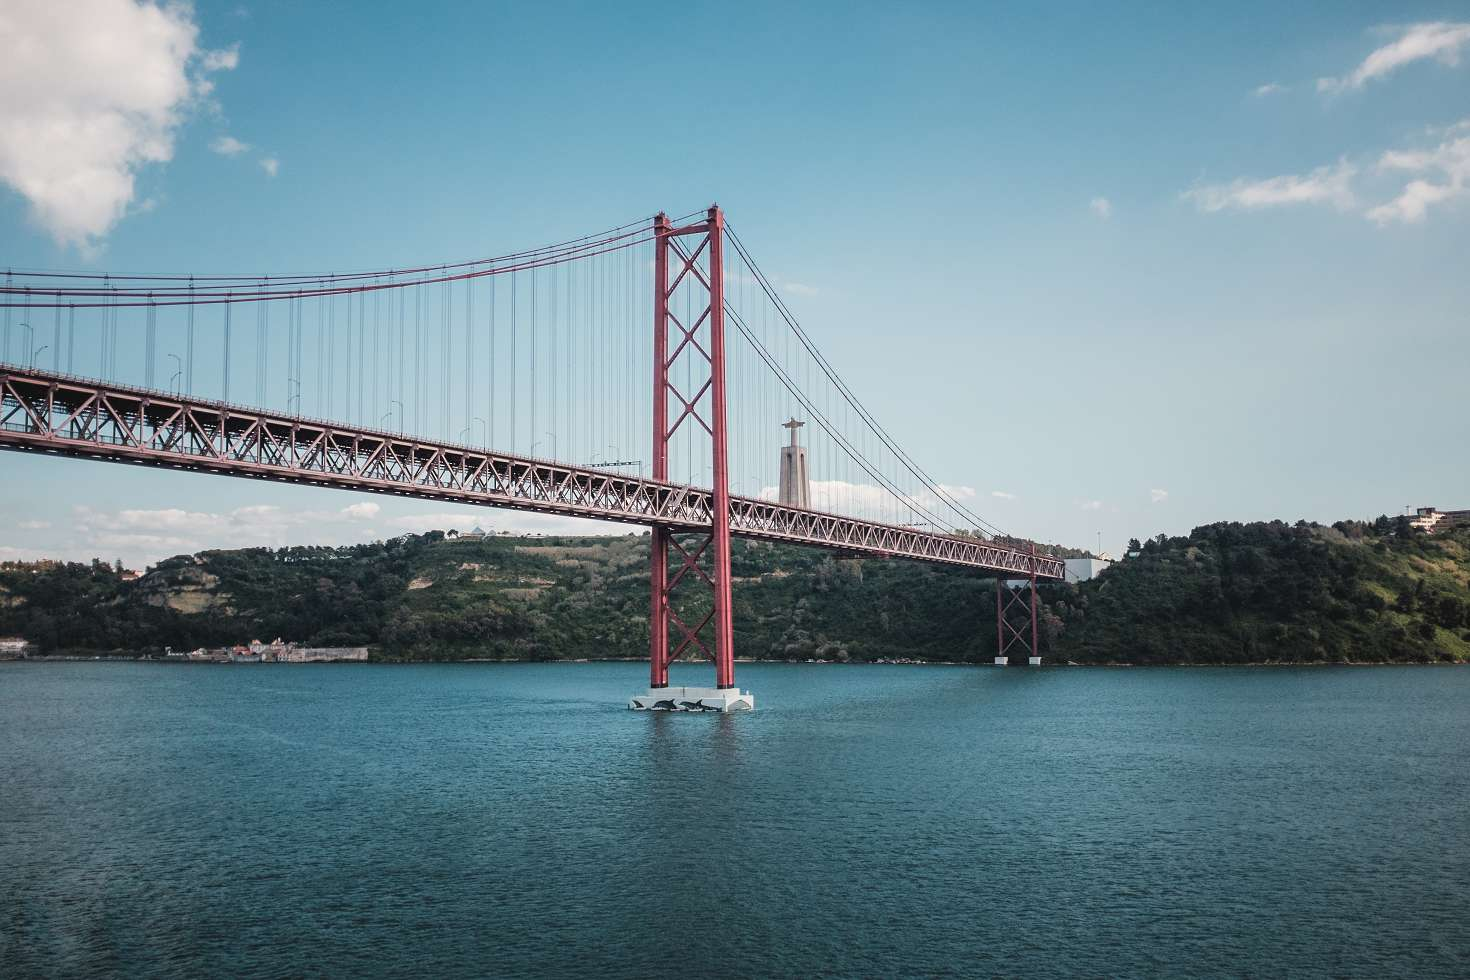 Valencia-Lissabon-Vigo-Stonehenge (55)